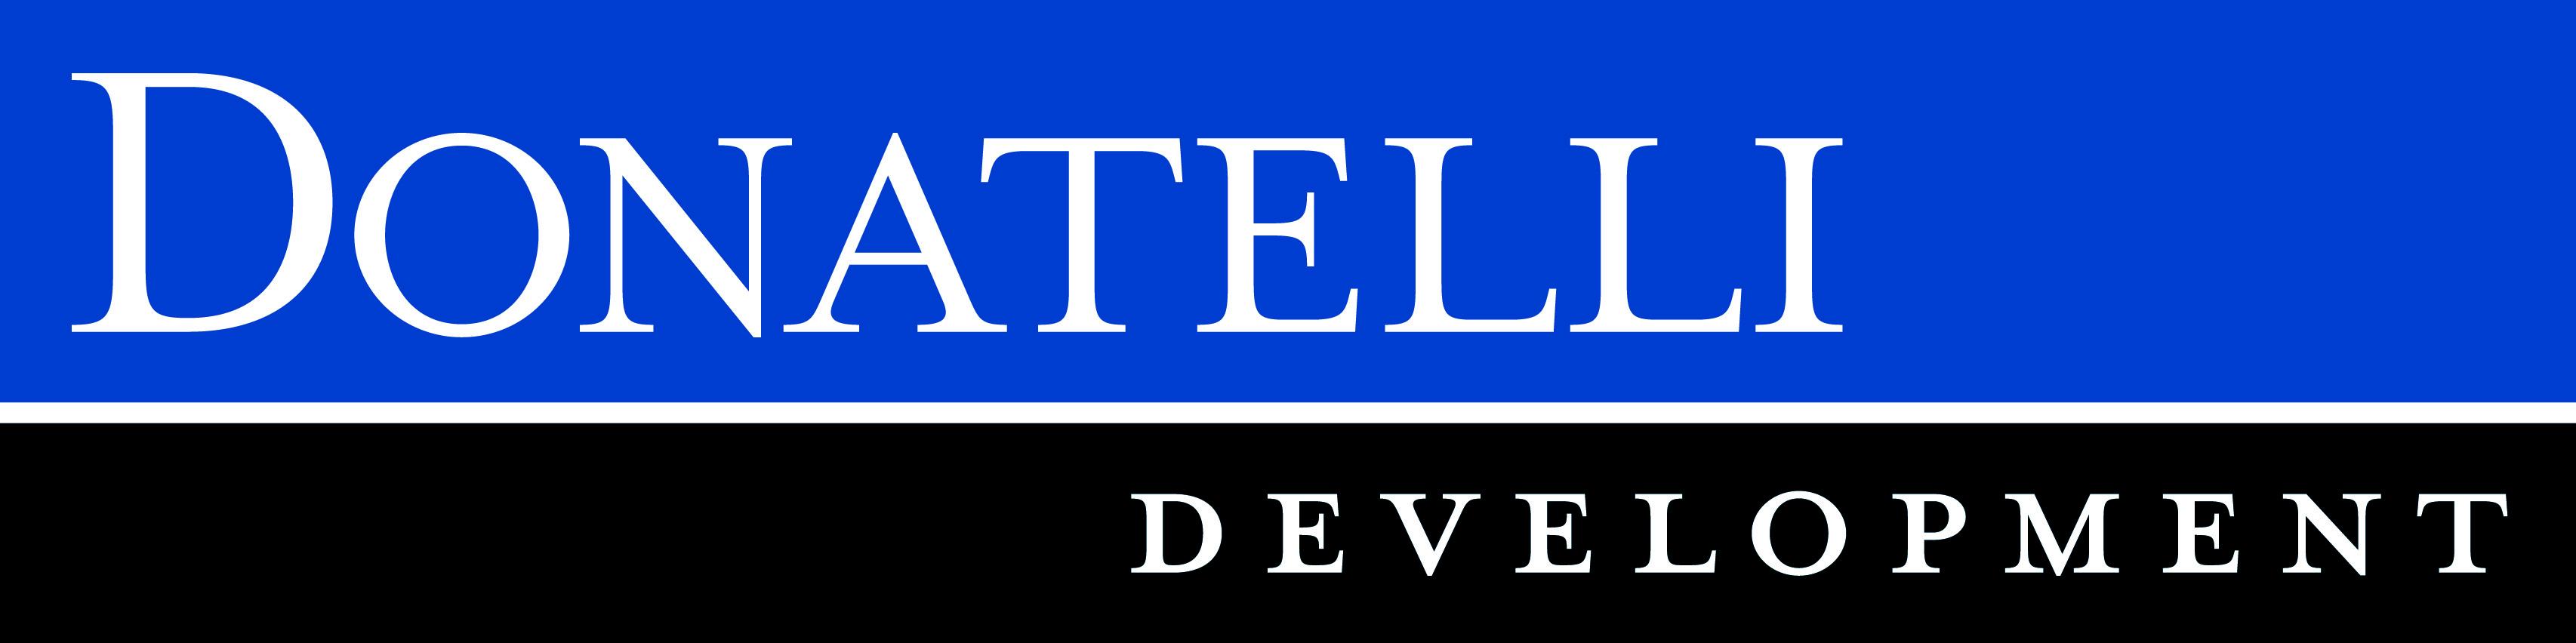 donatelli logo